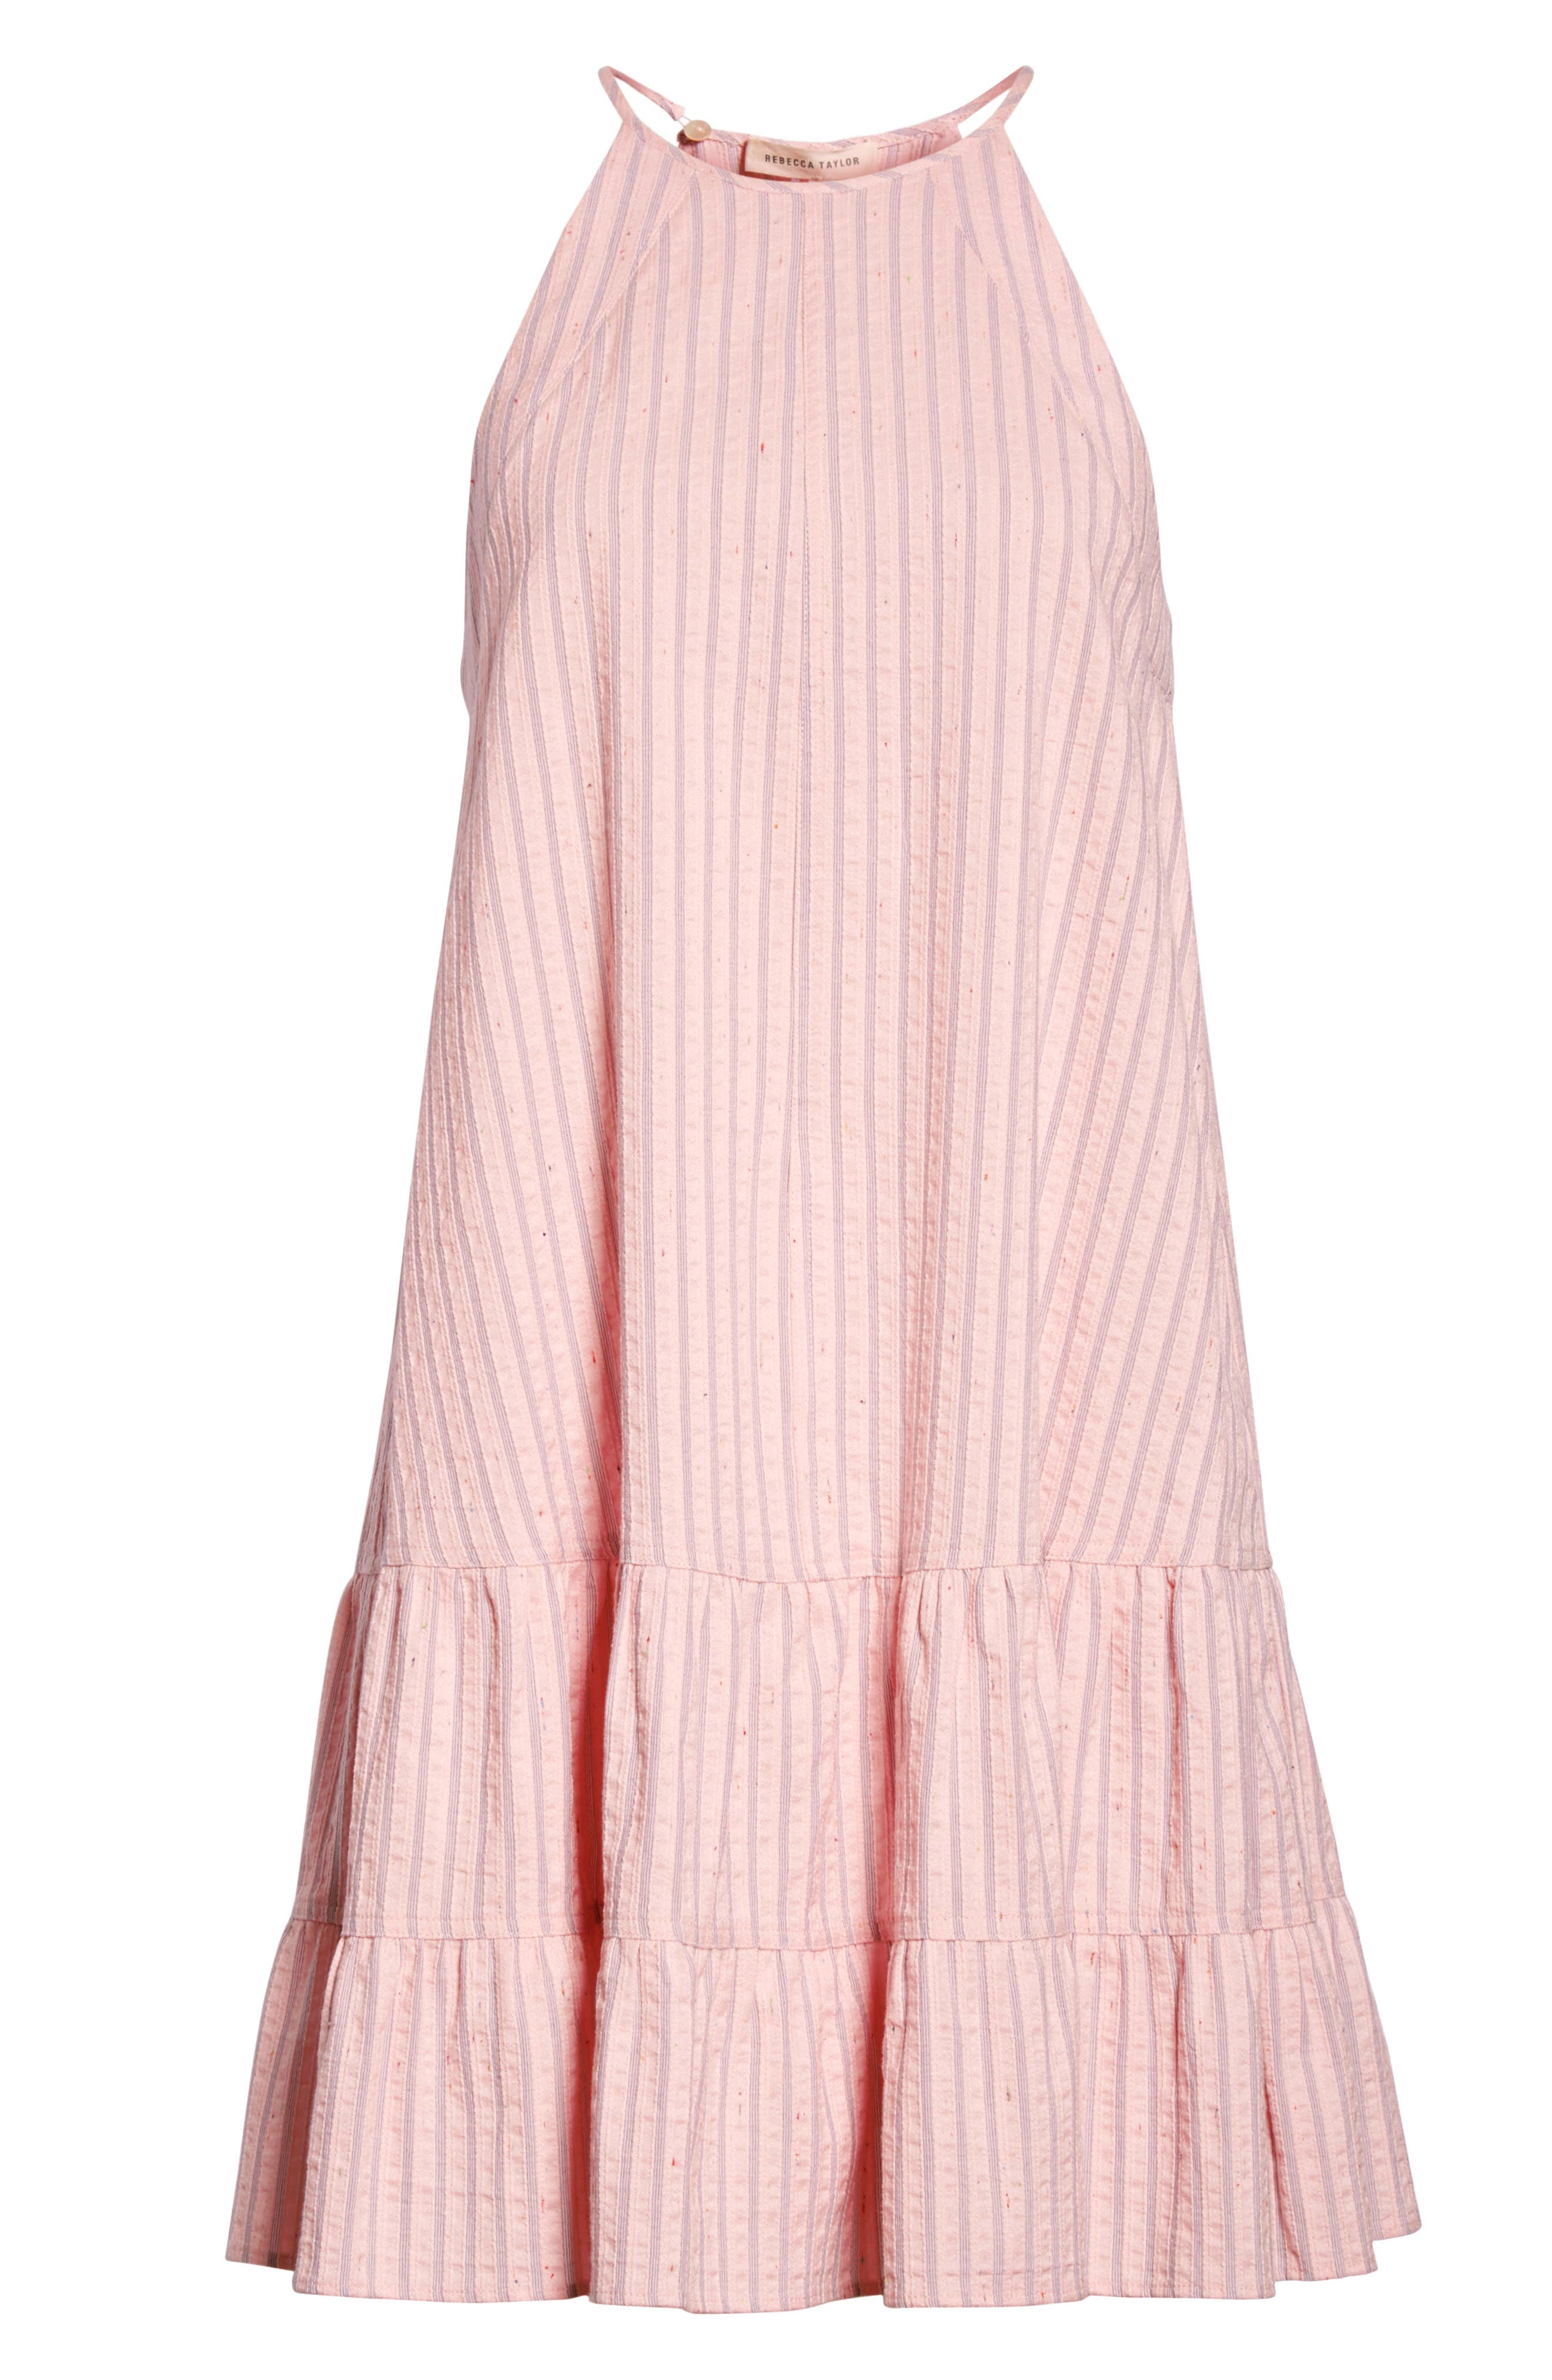 Sleeveless Stripe Tank Dress,                             Alternate thumbnail 6, color,                             Candy Floss Combo